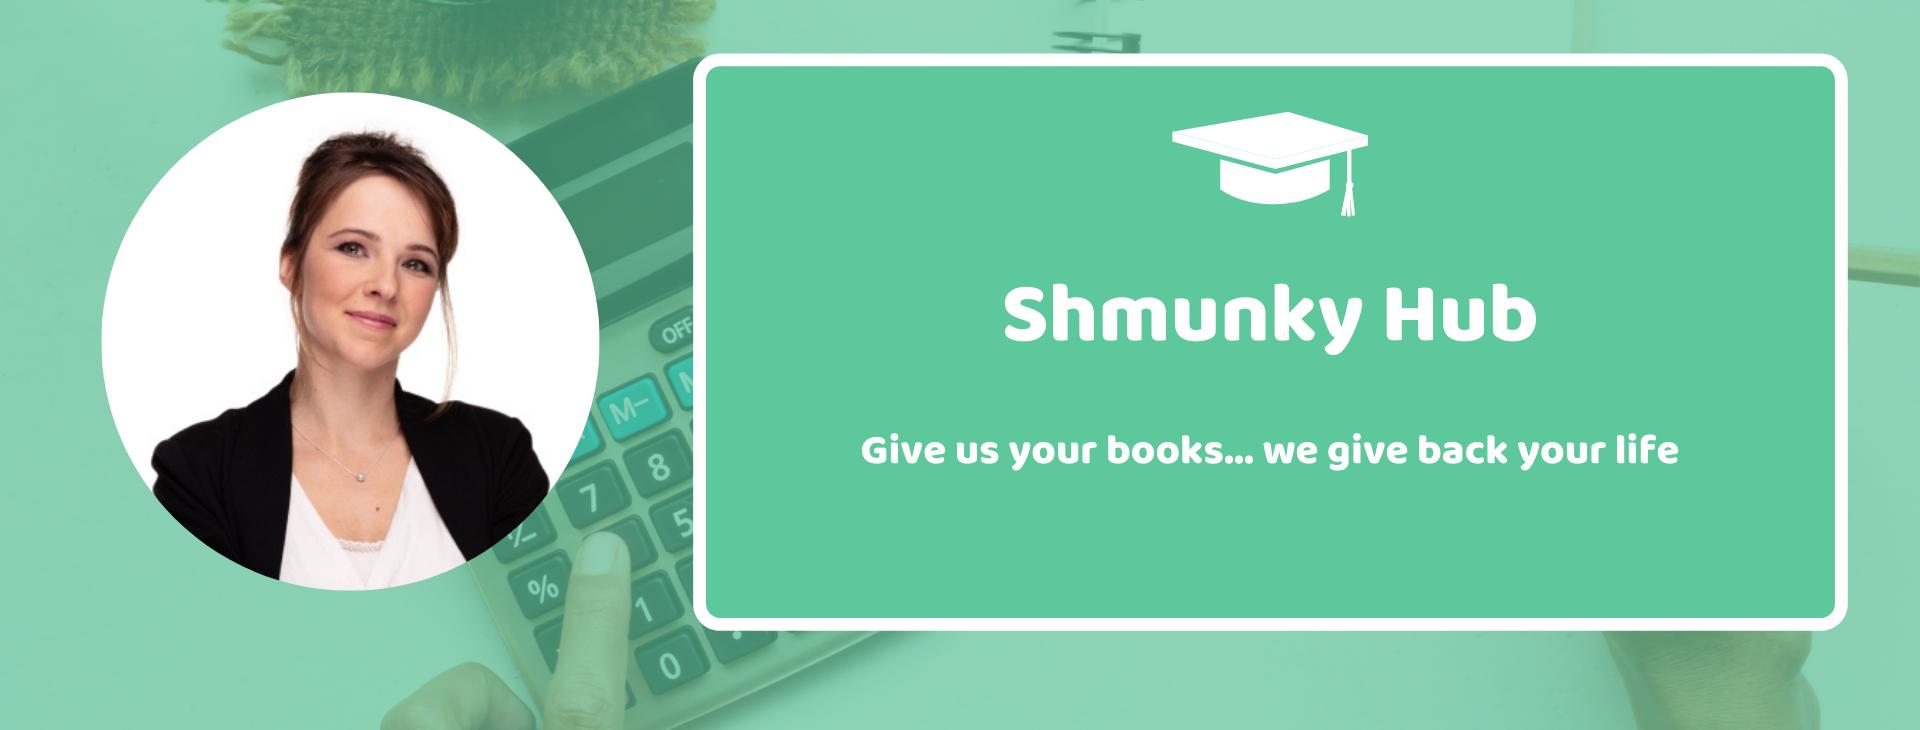 Shmunky Hub